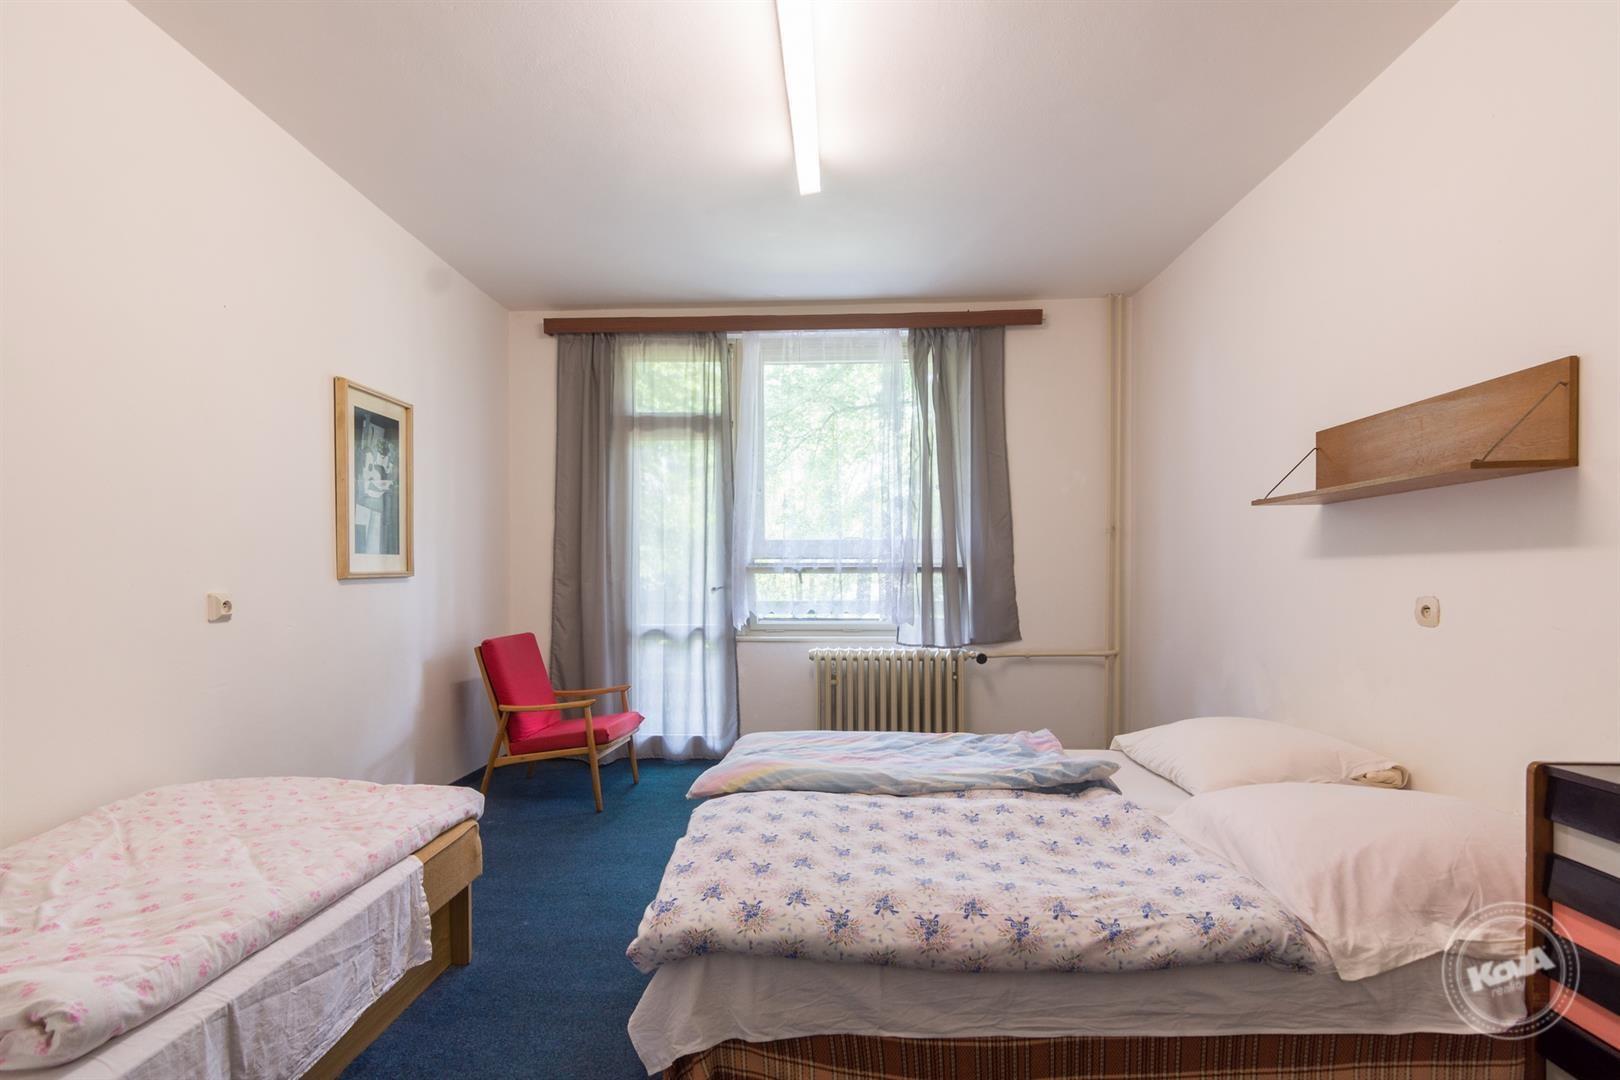 Pokoje pro hosty s balkony